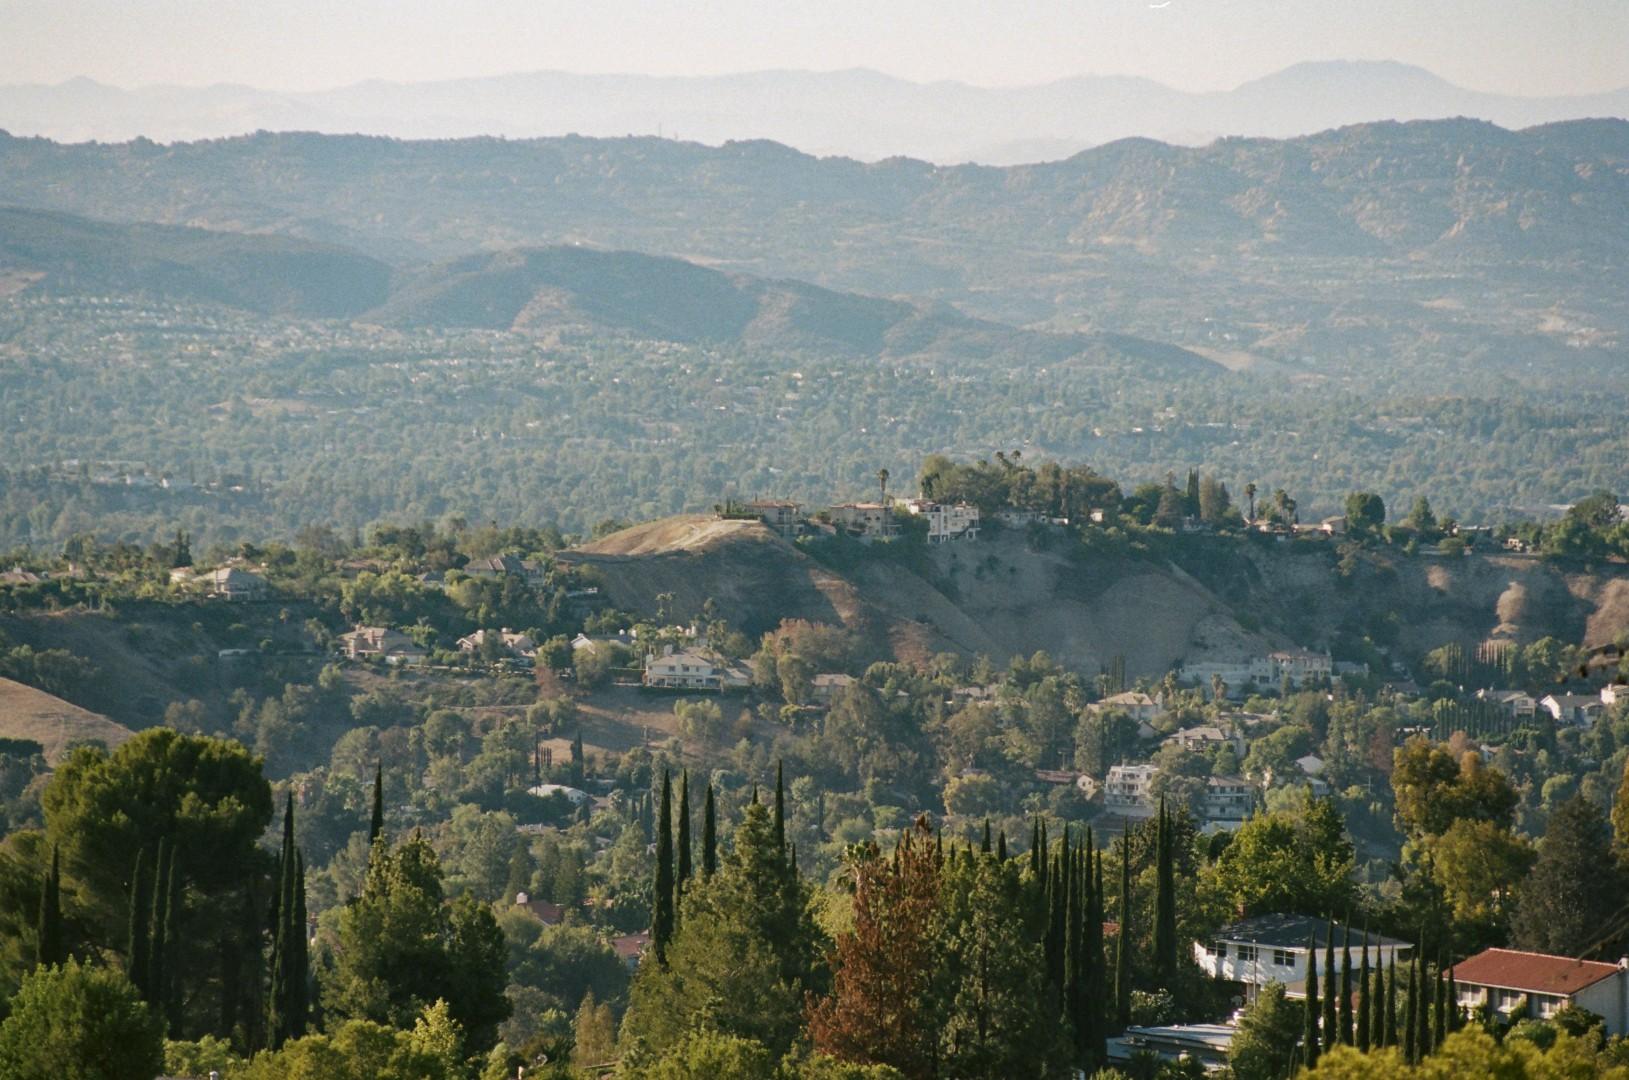 Mountain top view located in Vista County California